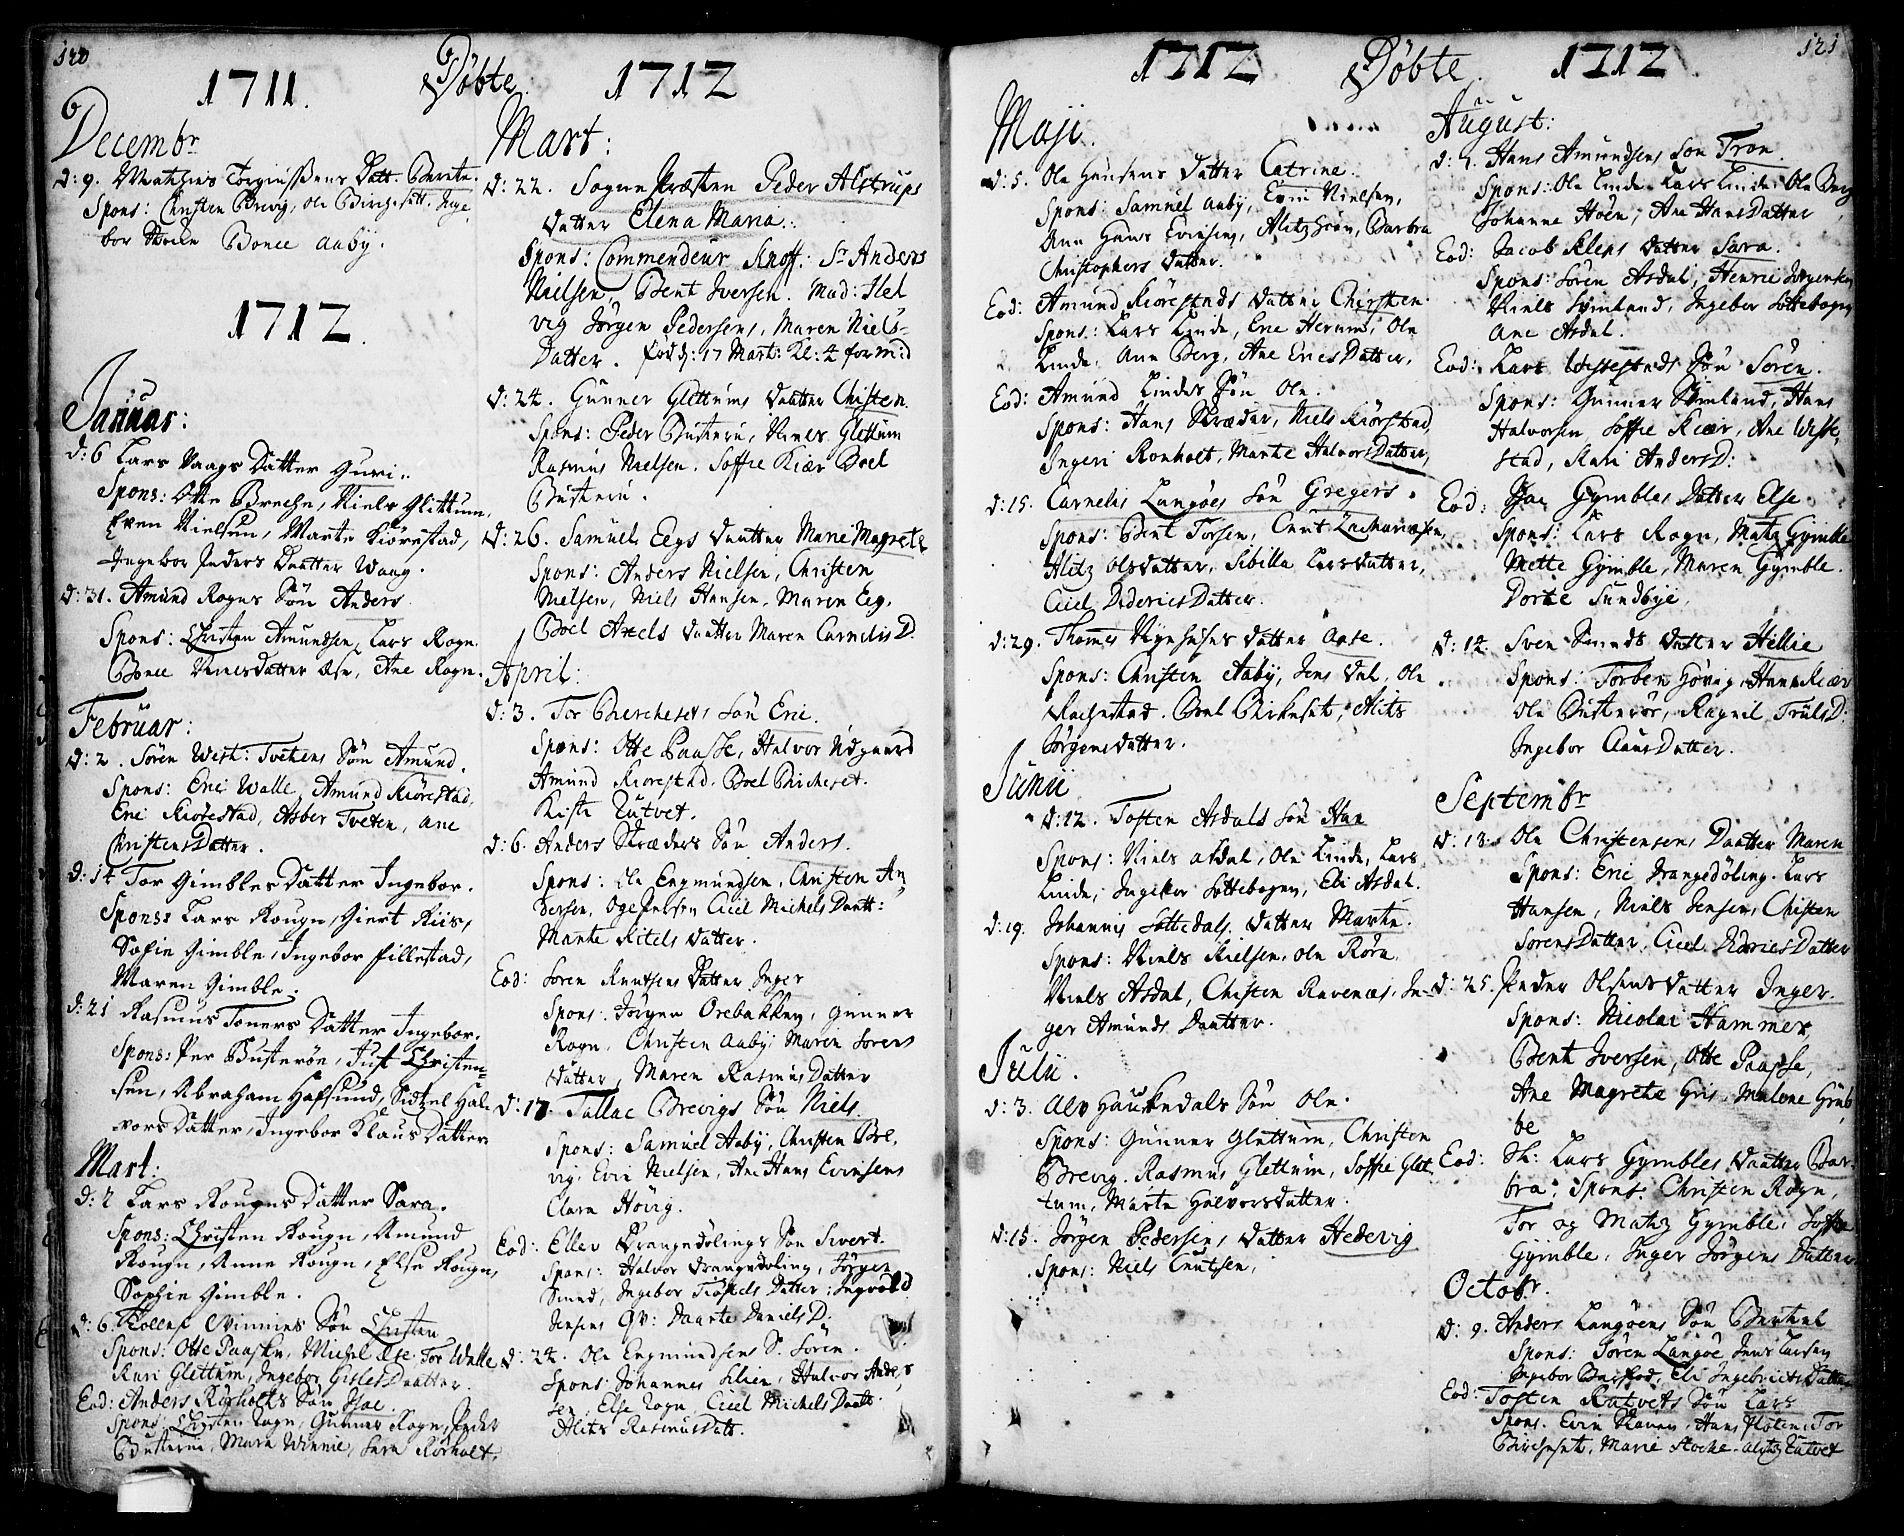 SAKO, Bamble kirkebøker, F/Fa/L0001: Ministerialbok nr. I 1, 1702-1774, s. 120-121